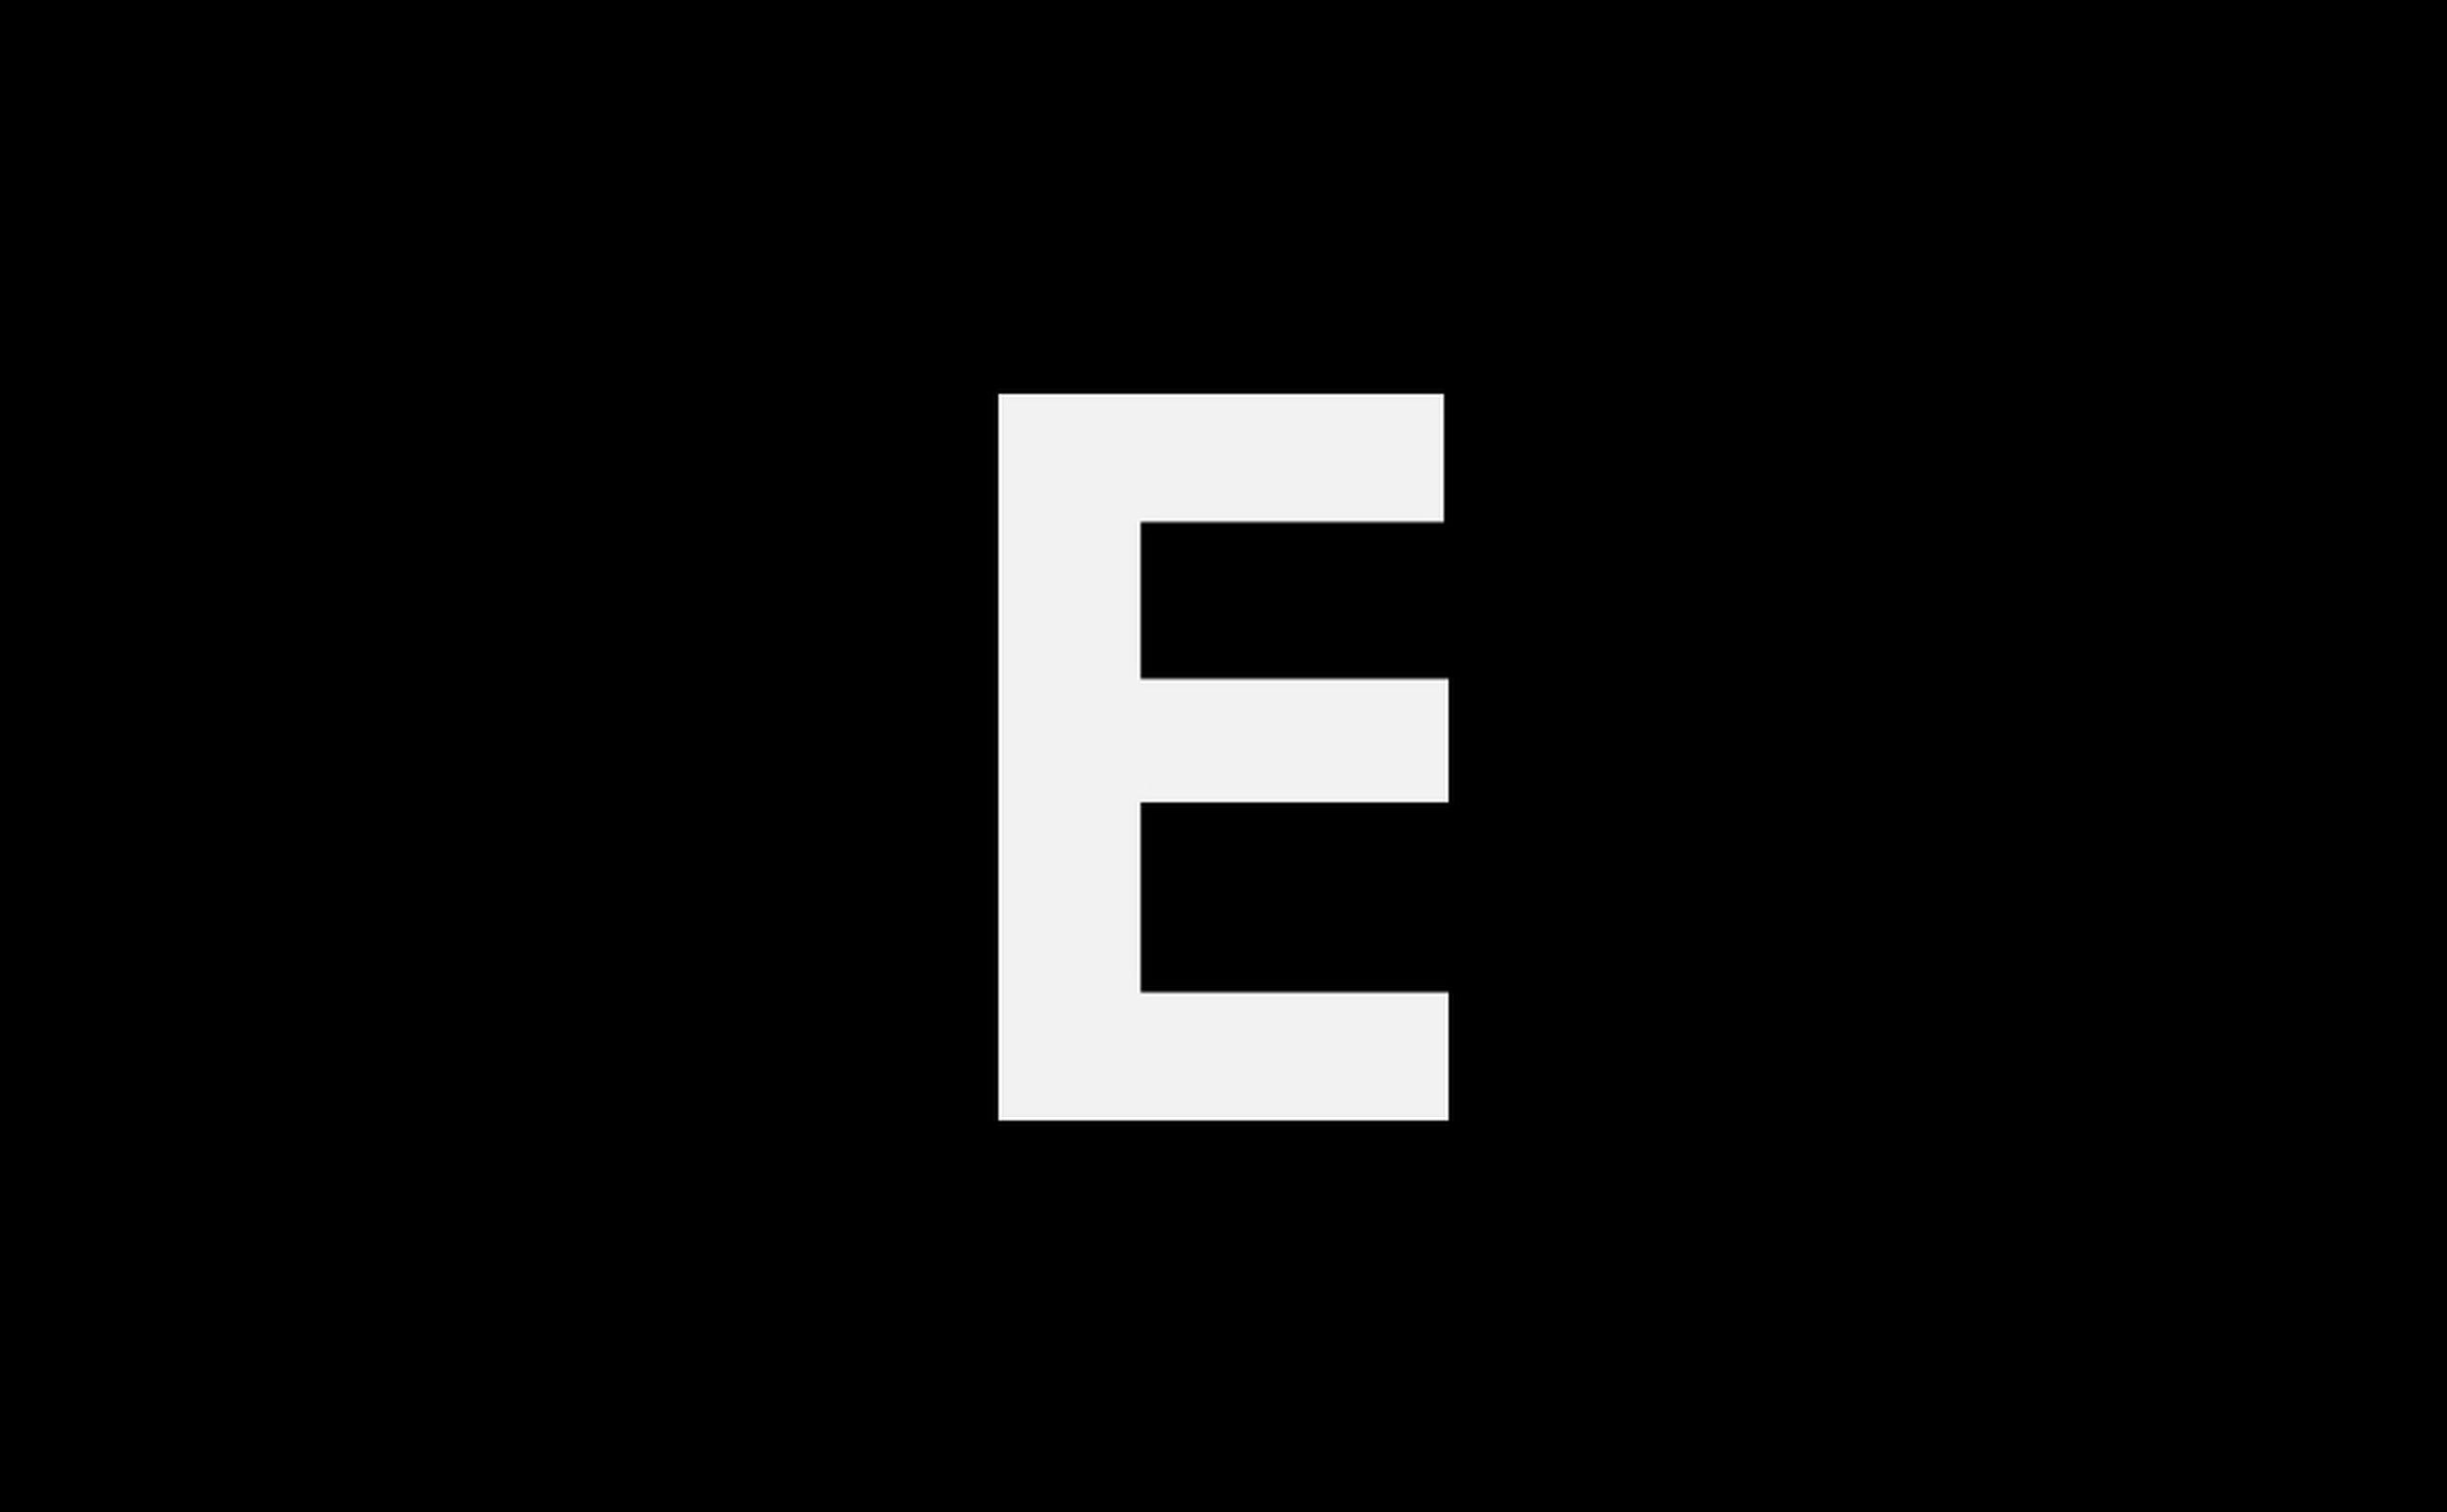 PORTRAIT OF CAT SITTING ON FLOOR